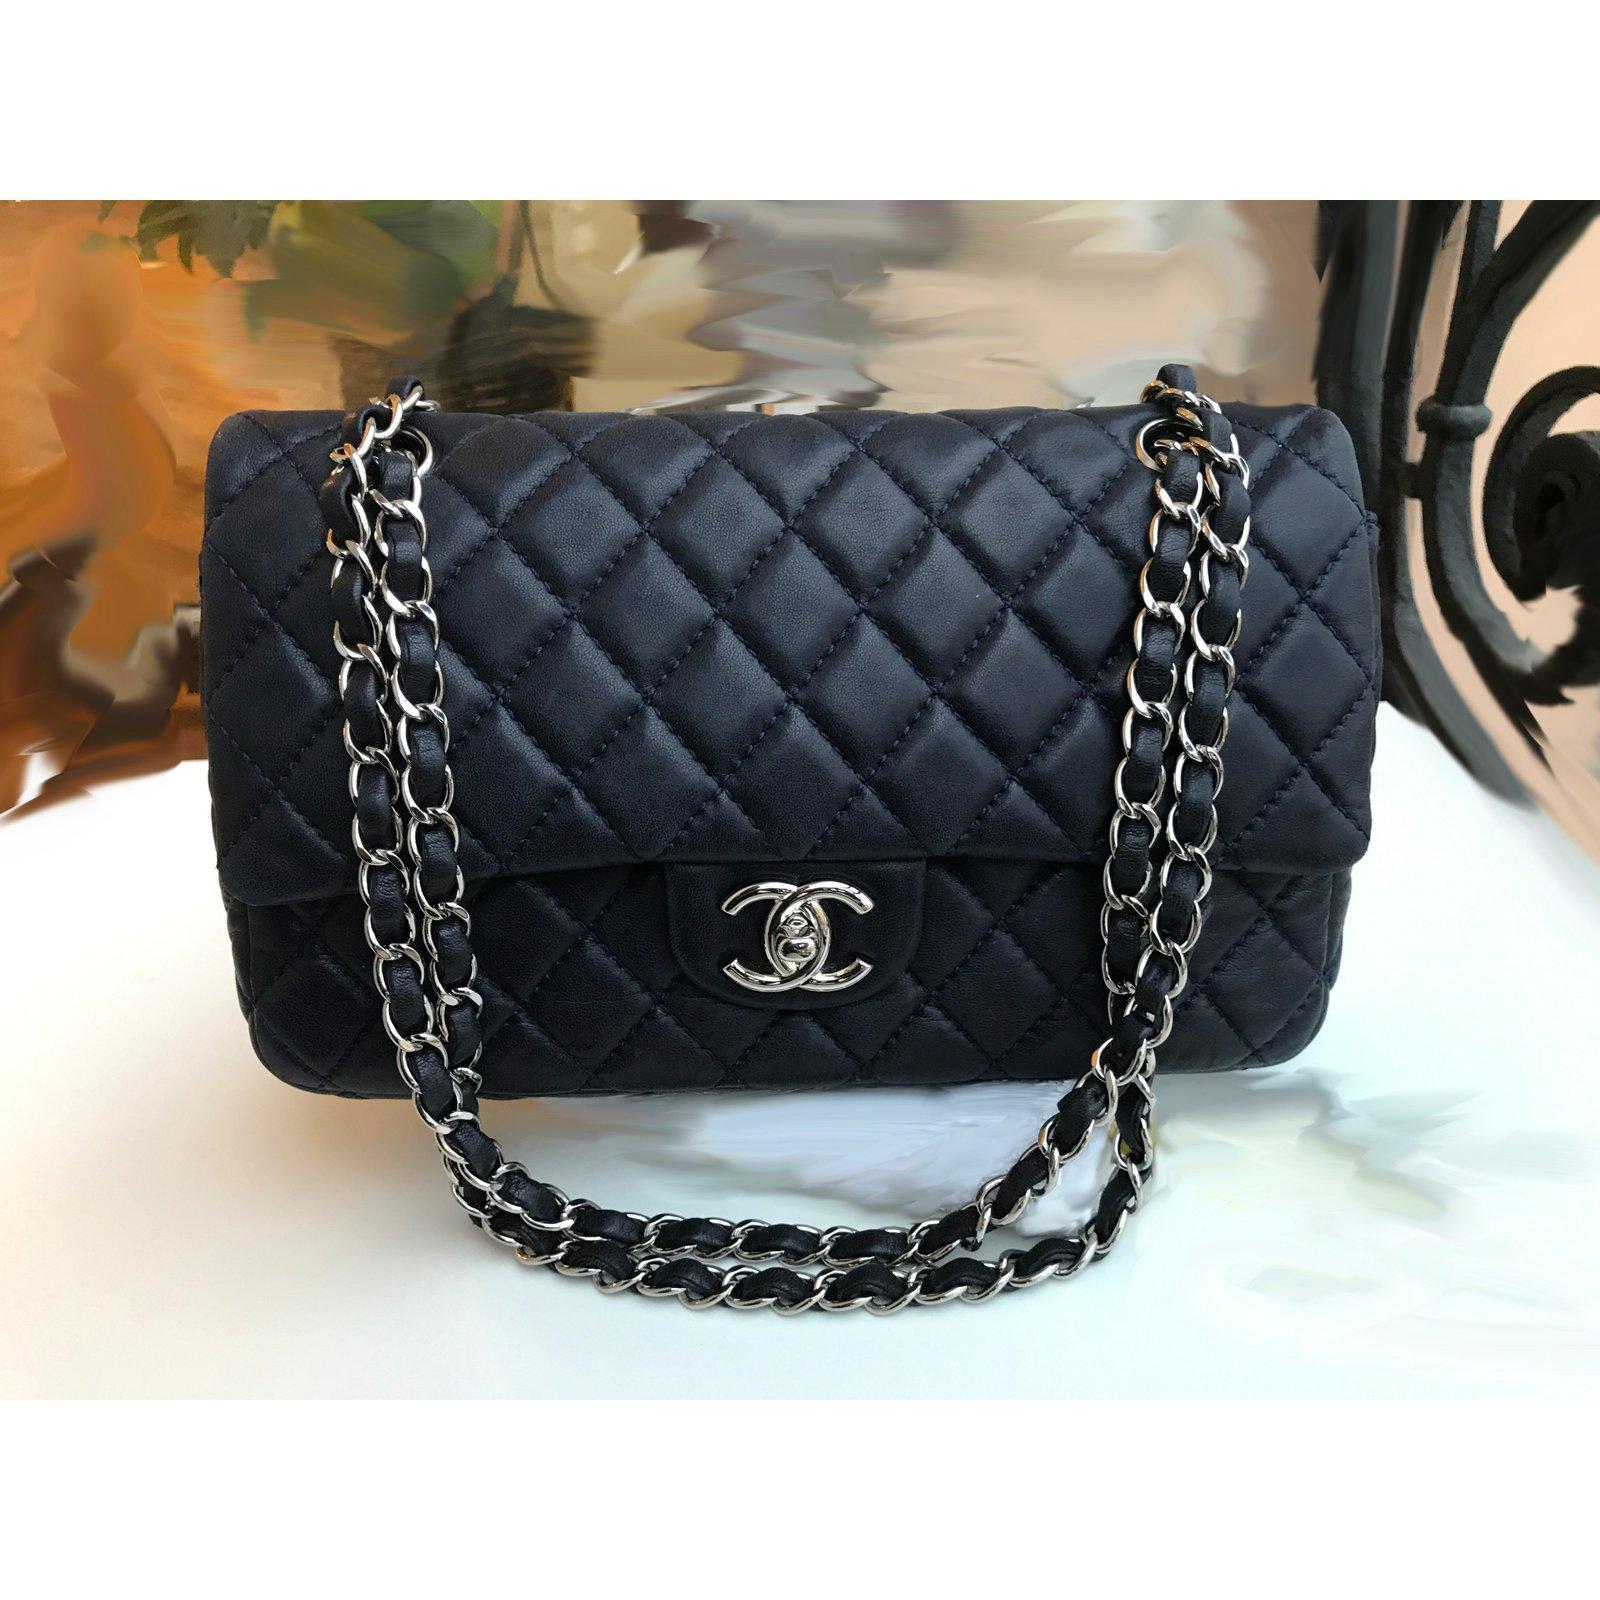 001beeb0e455a7 Chanel Medium Double Flap Timeless Bag Handbags Leather Blue,Navy ...